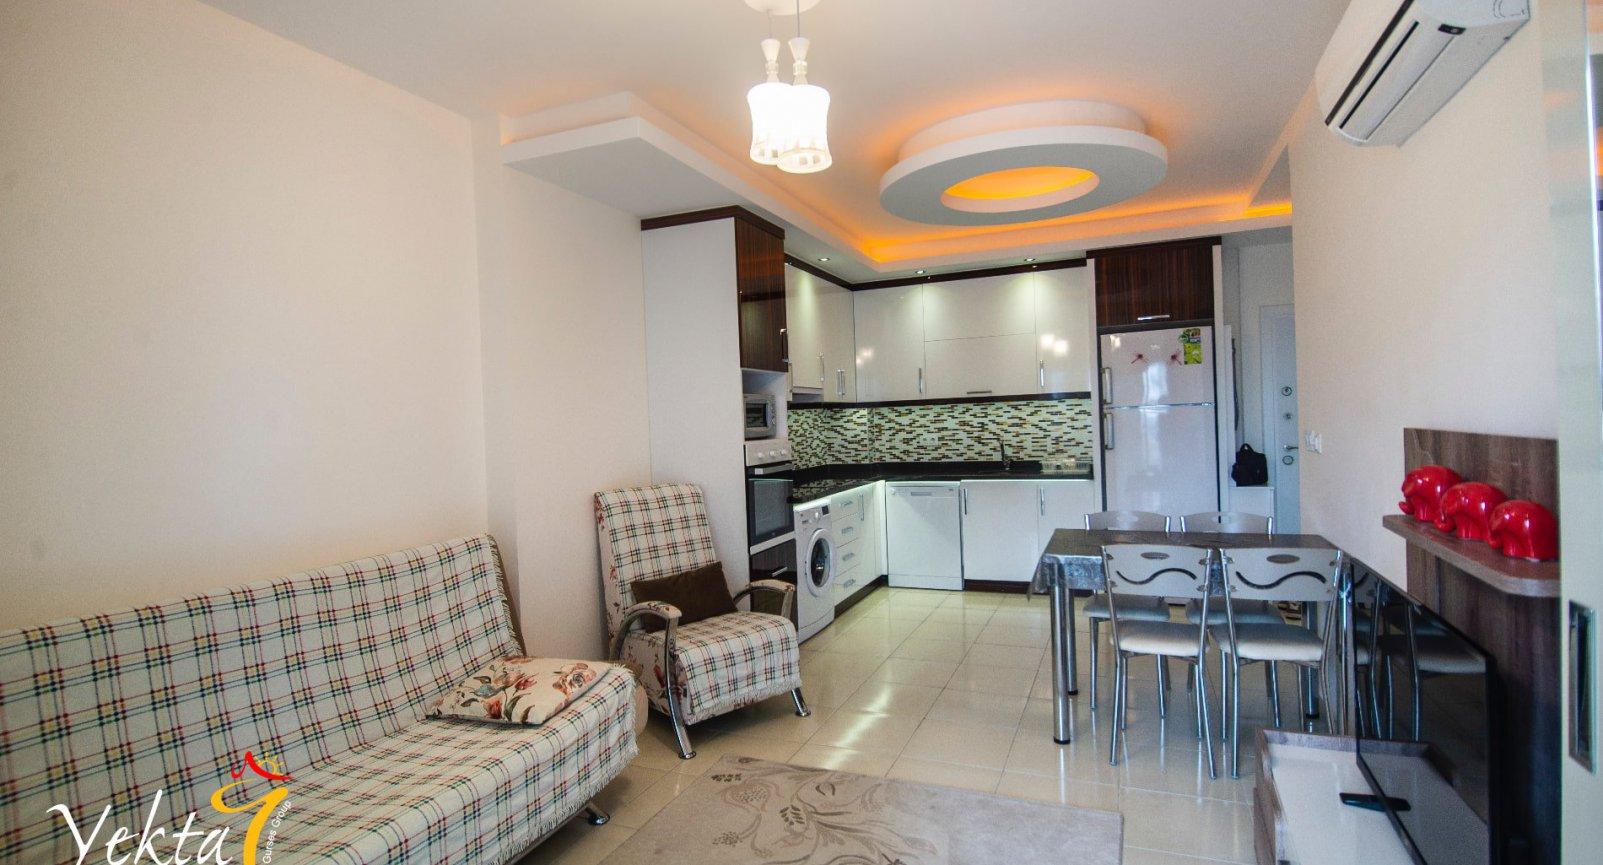 Wonderful apartment 1+1 in a nice calm area of Mahmutlar